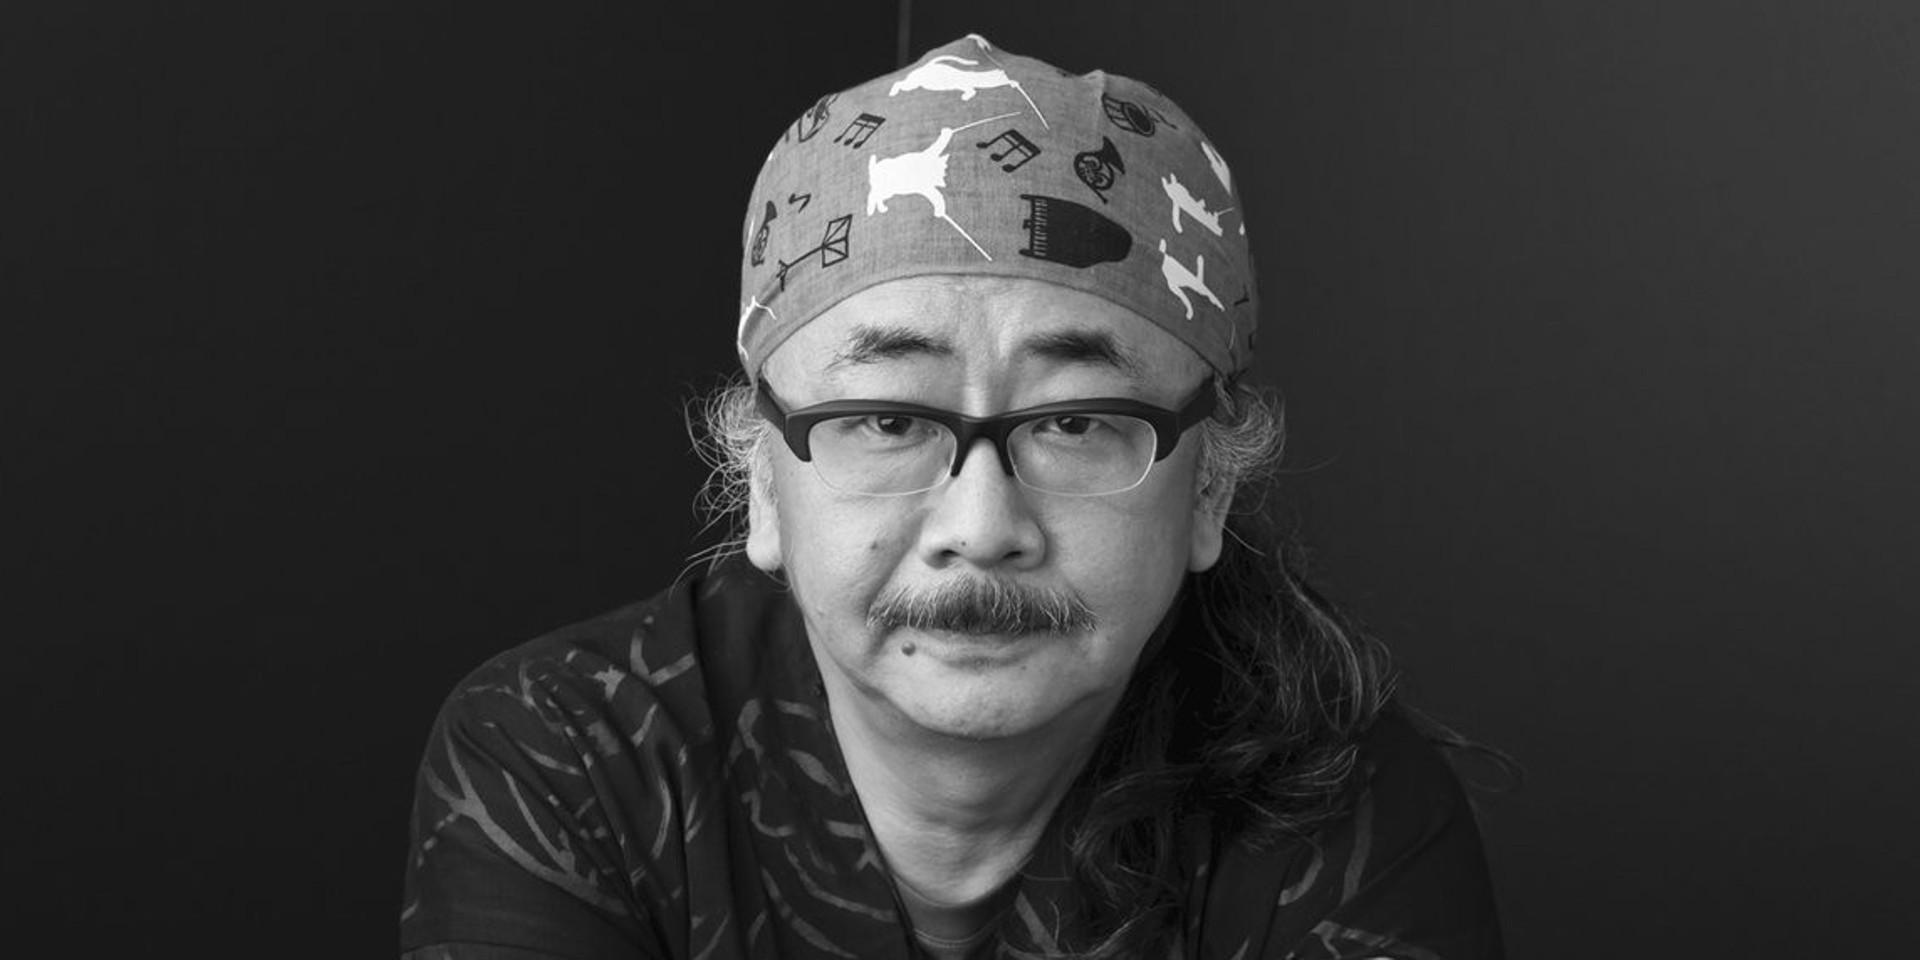 Final Fantasy composer Nobuo Uematsu may have scored his last full soundtrack